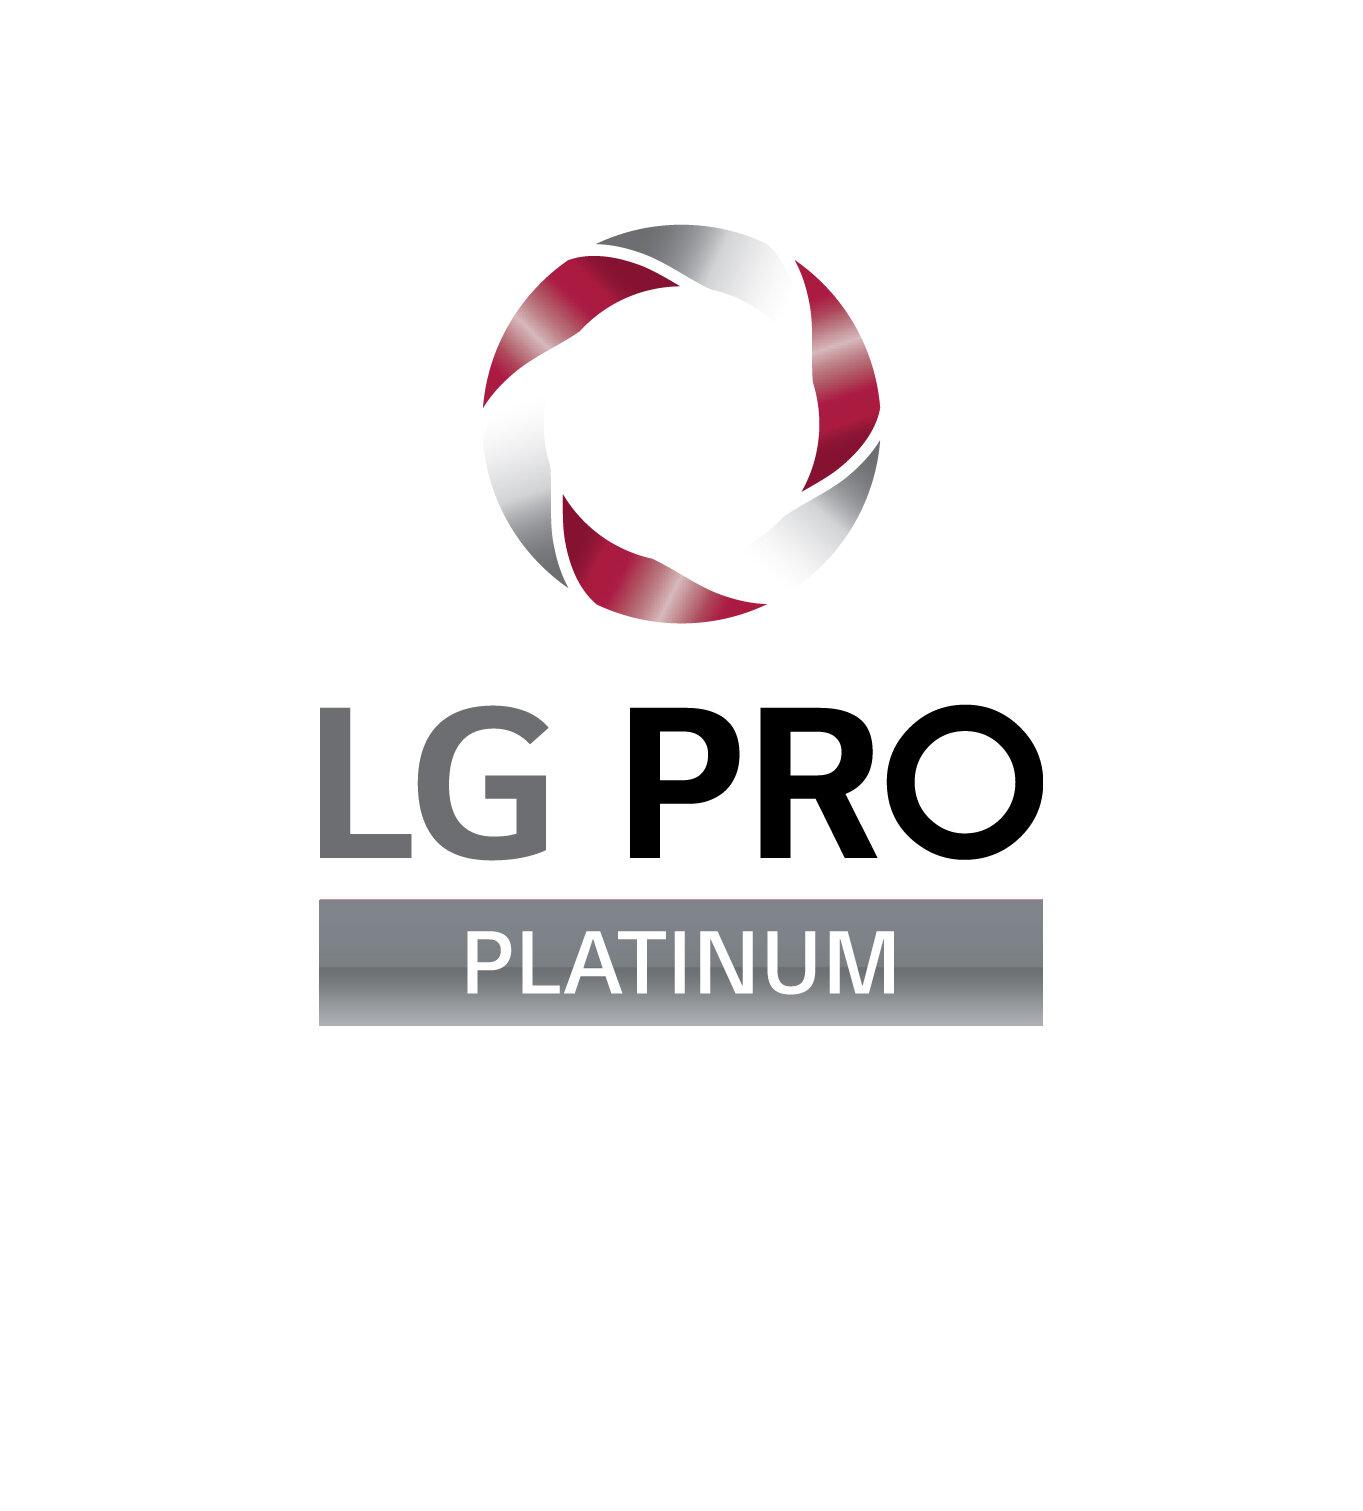 LGProLogo_Platinum (1).jpg